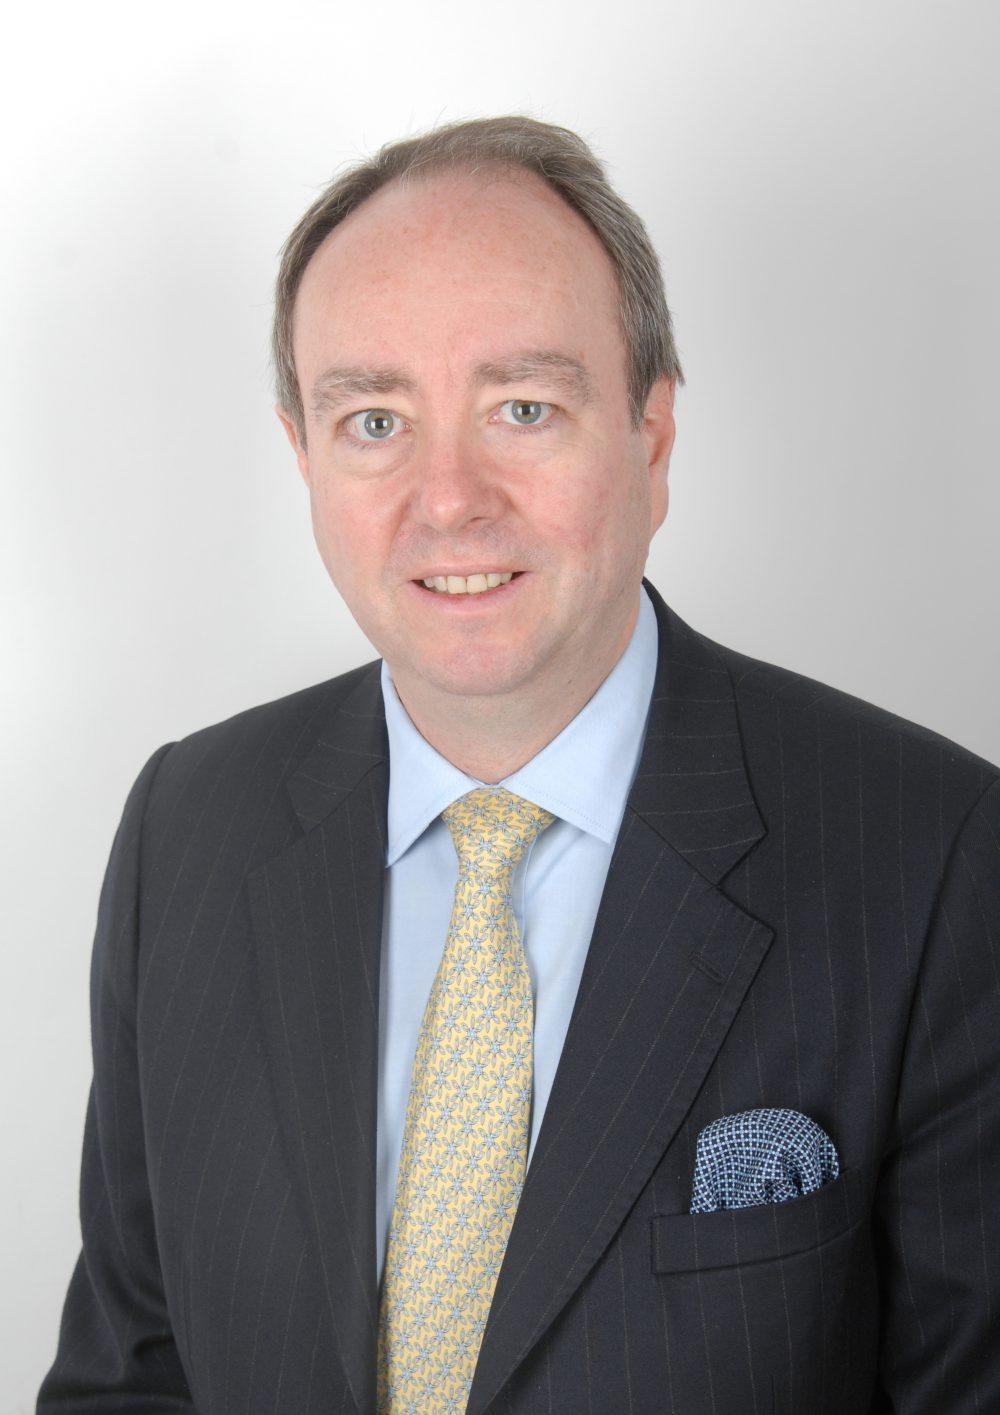 Paul Varney